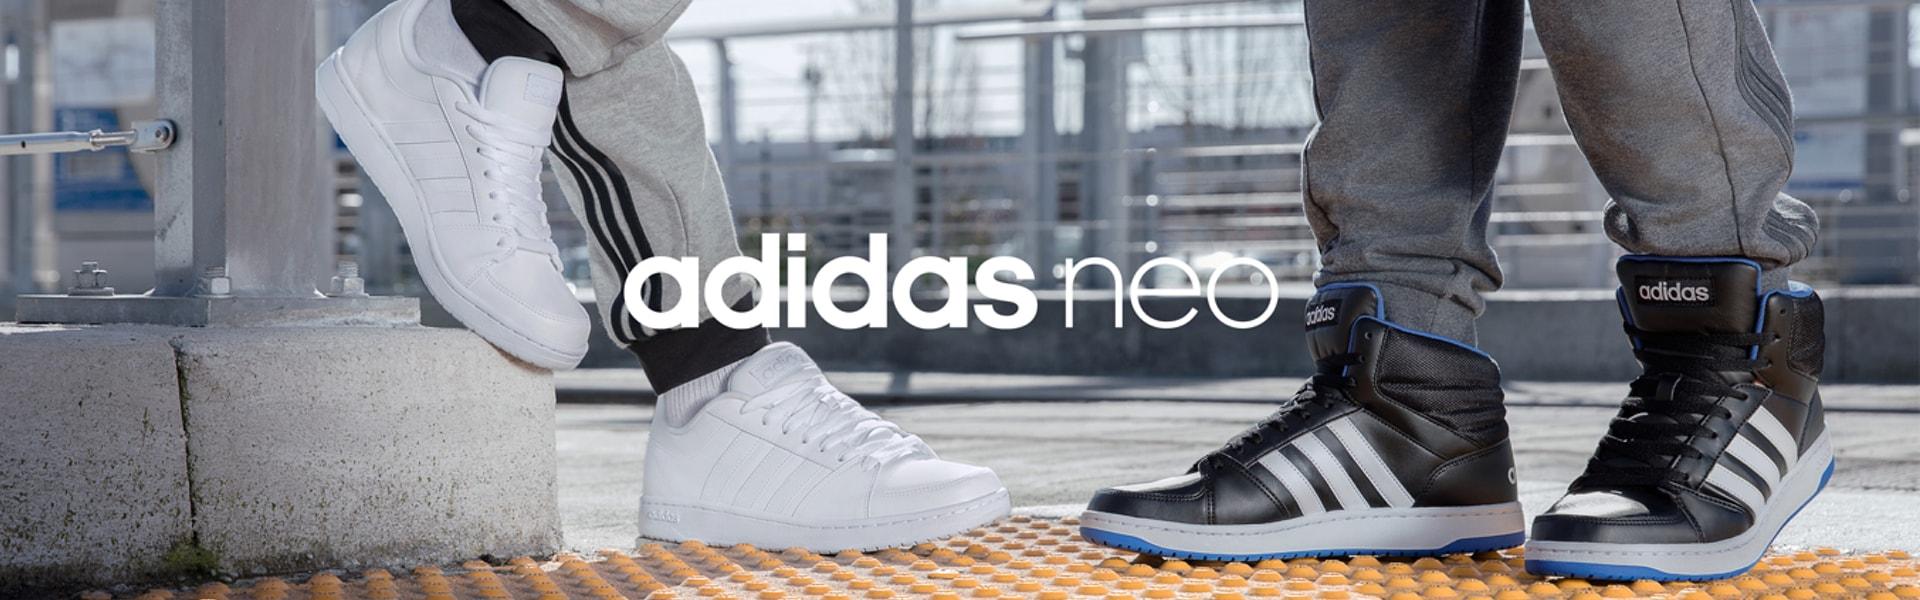 adidas_neo.jpg